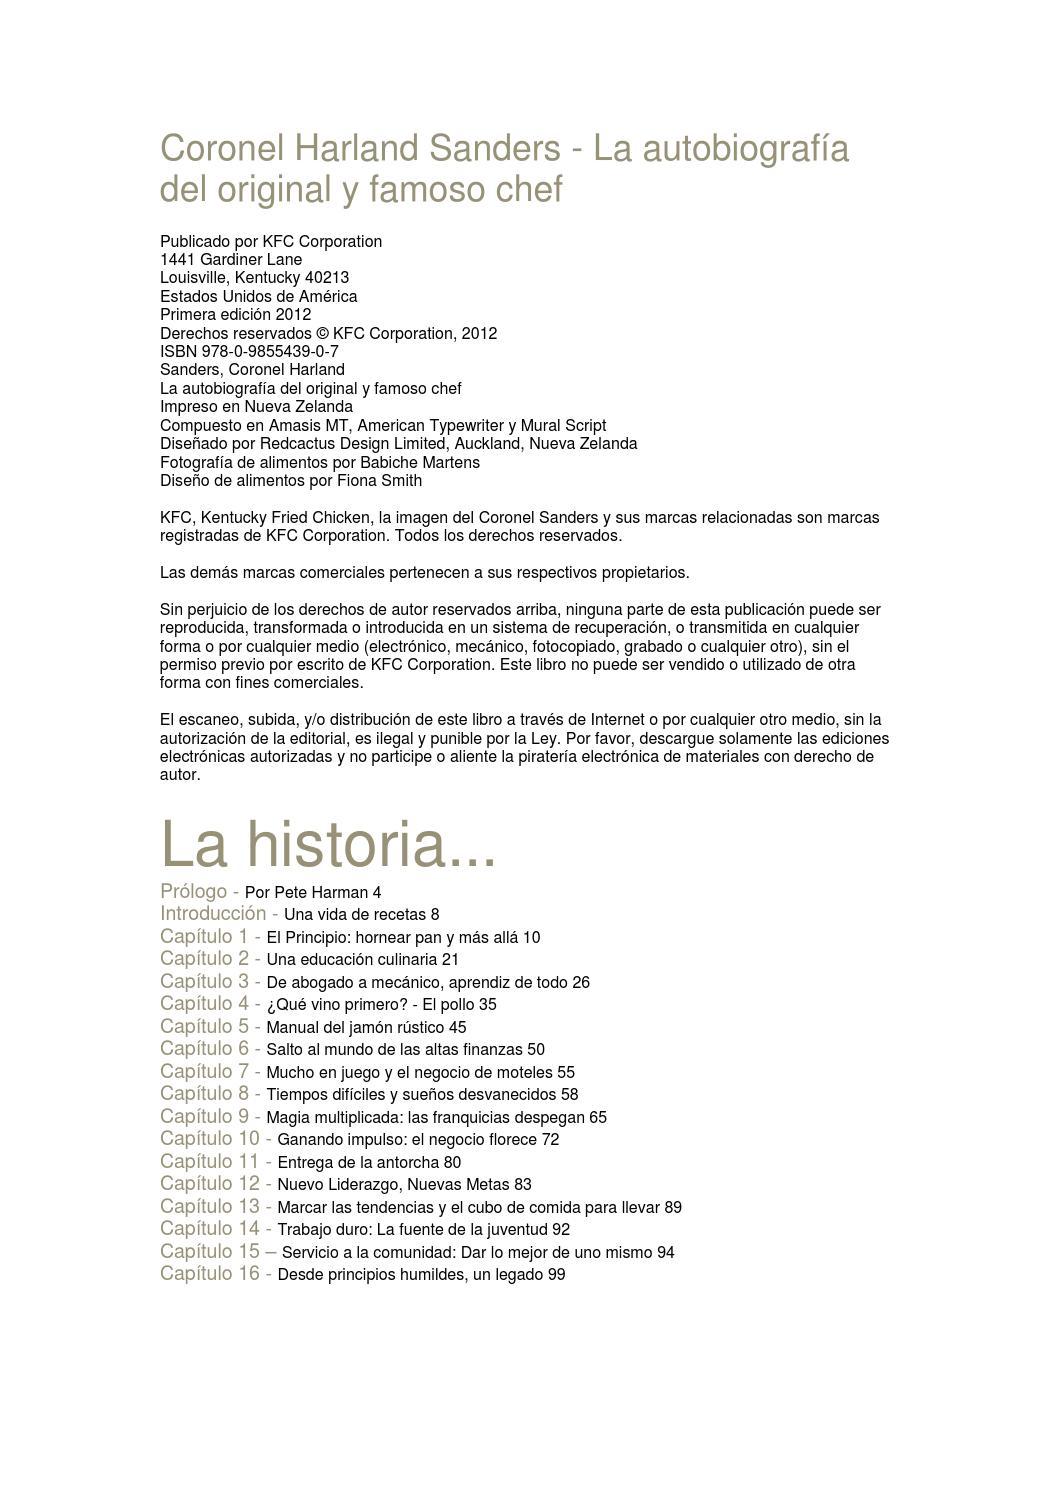 Kfc by Jose Carlos Fuertes - issuu